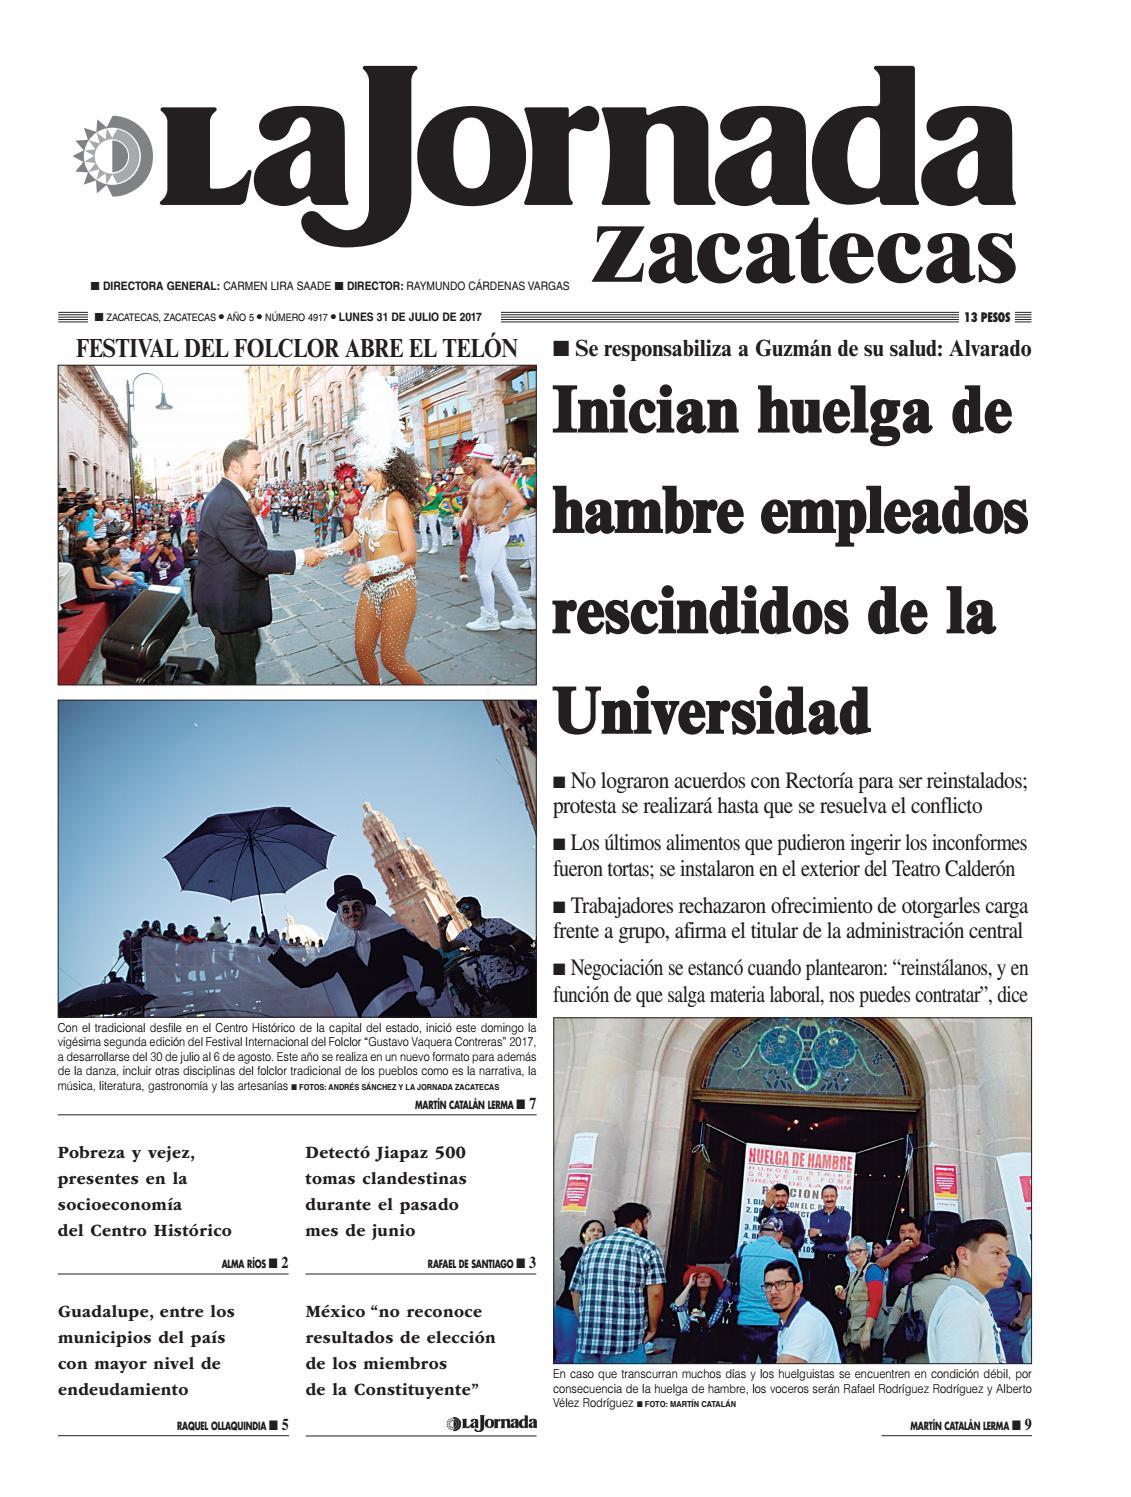 La Jornada Zacatecas Lunes 31 De Julio De 2017 By La Jornada  # Muebles Goitia Tijuana